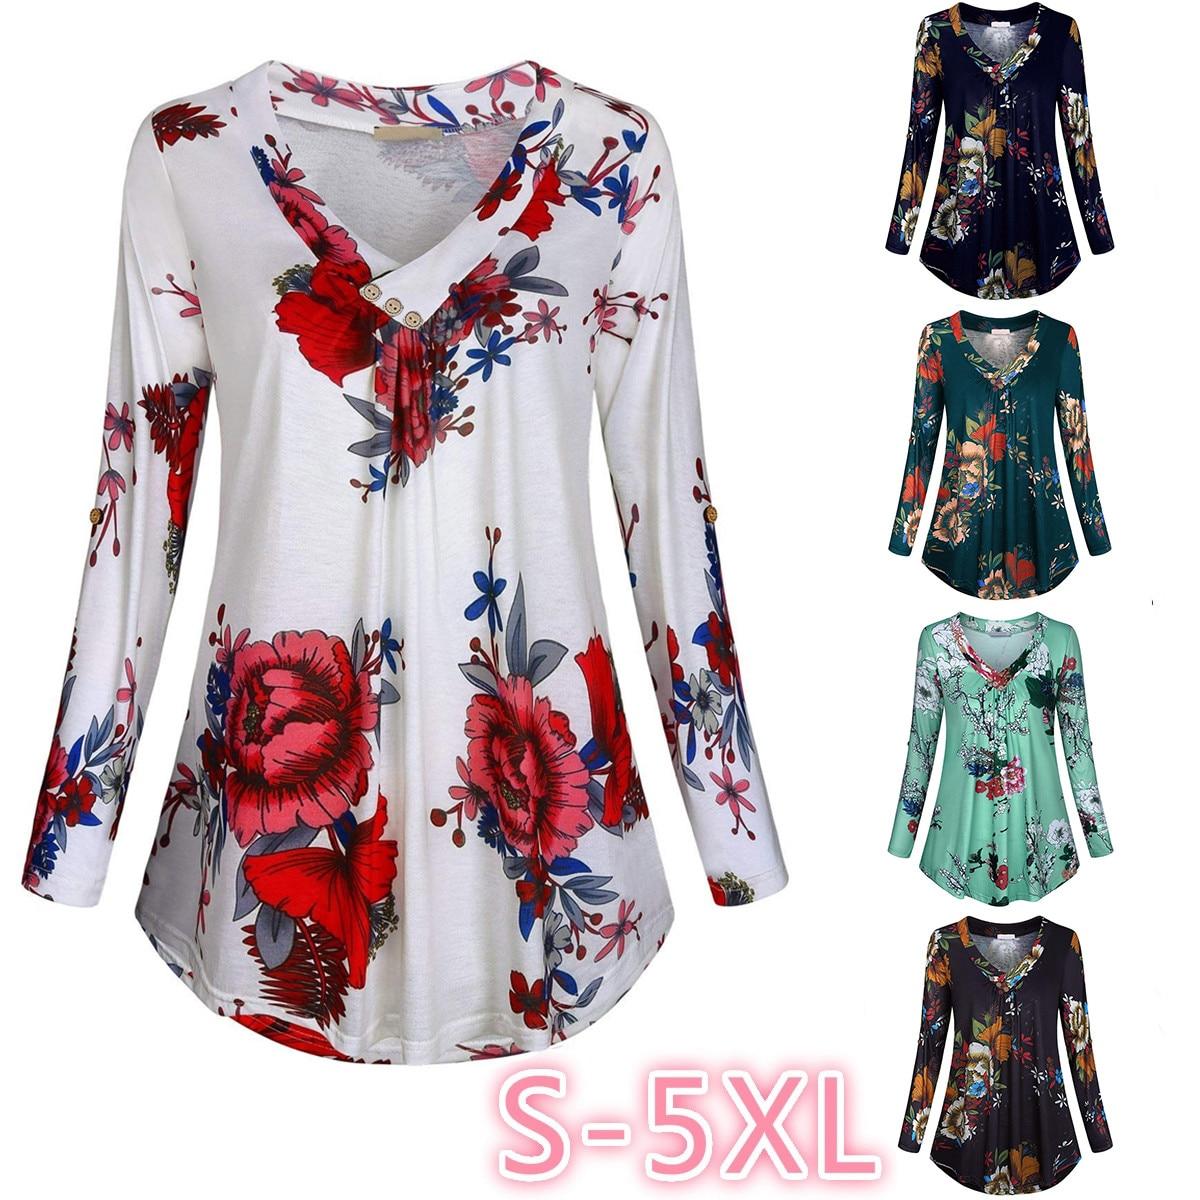 2018 Women Plus Size Long Sleeve Print V-neck Button Pullover Loose temperament casual print Tops women sweatshirt cotton